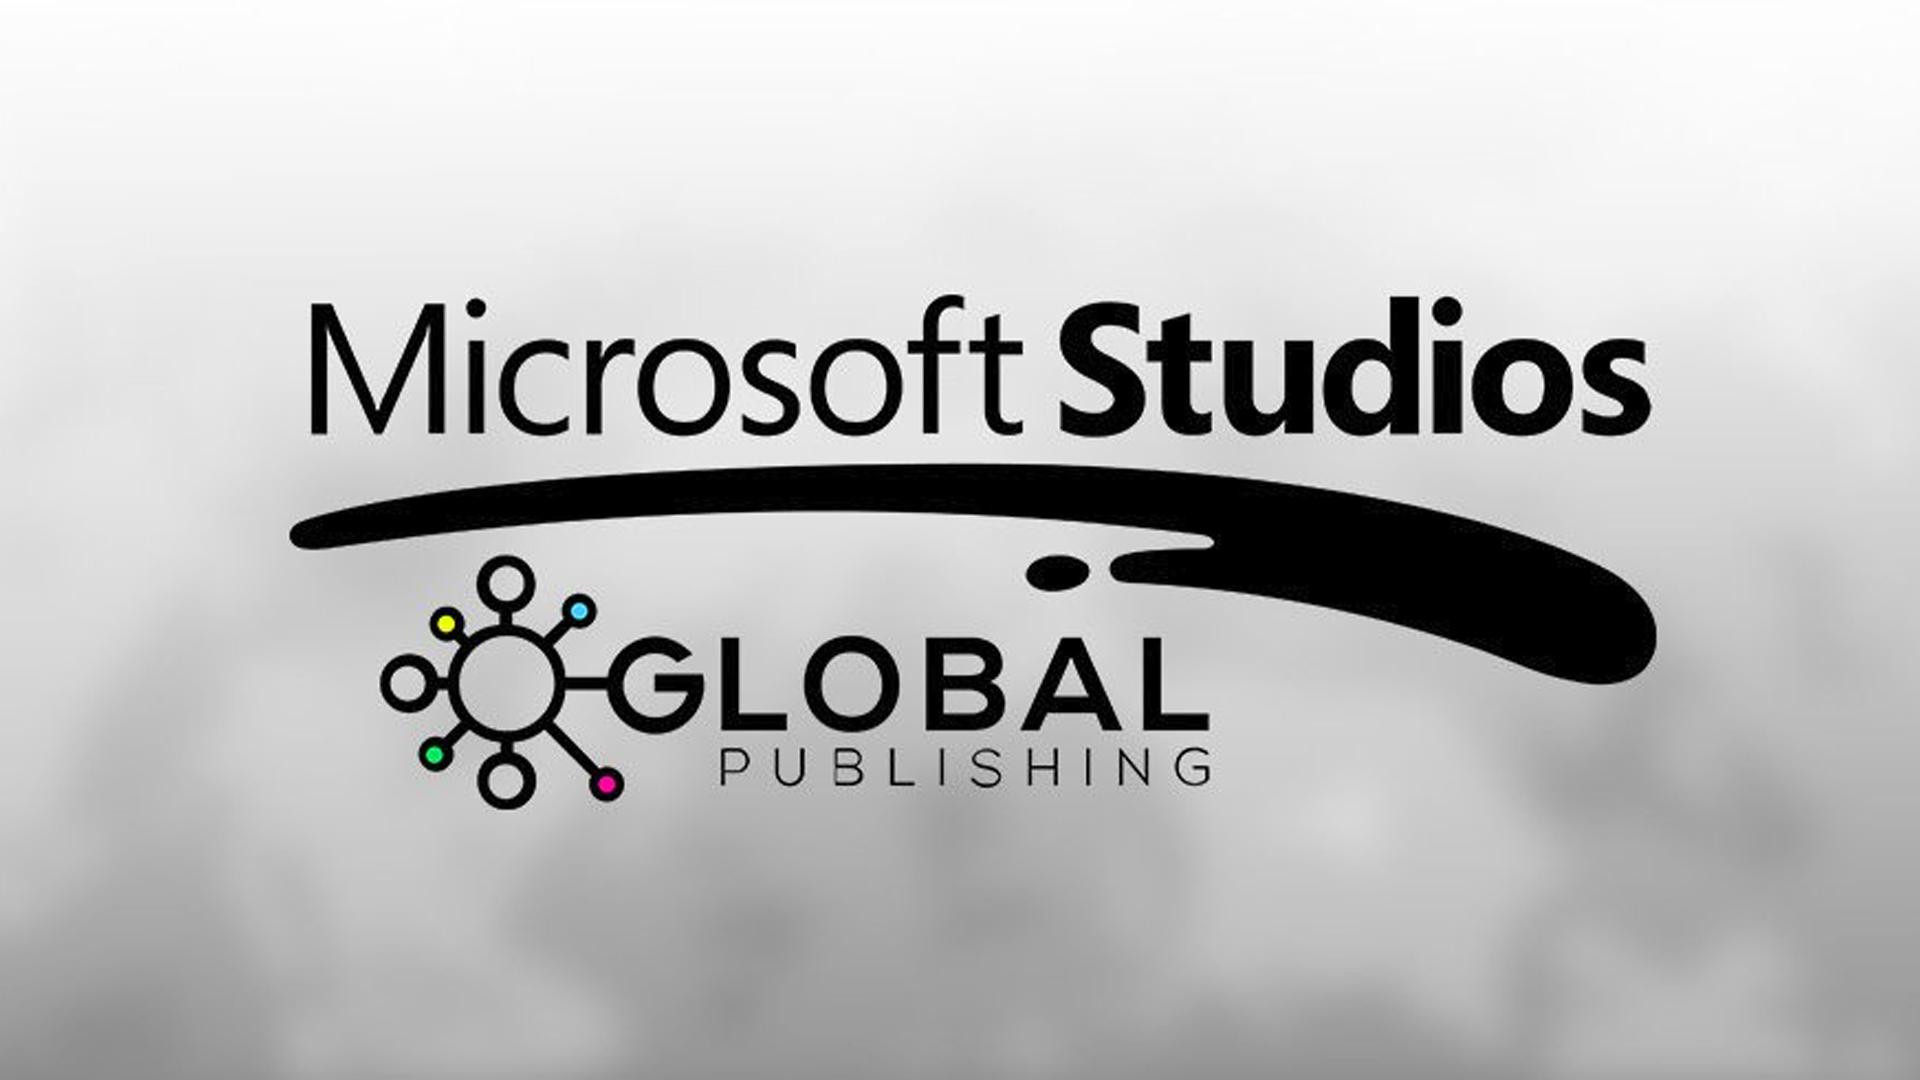 Microsoft Studios Global Publishing Rebrand - Gamerheadquarters